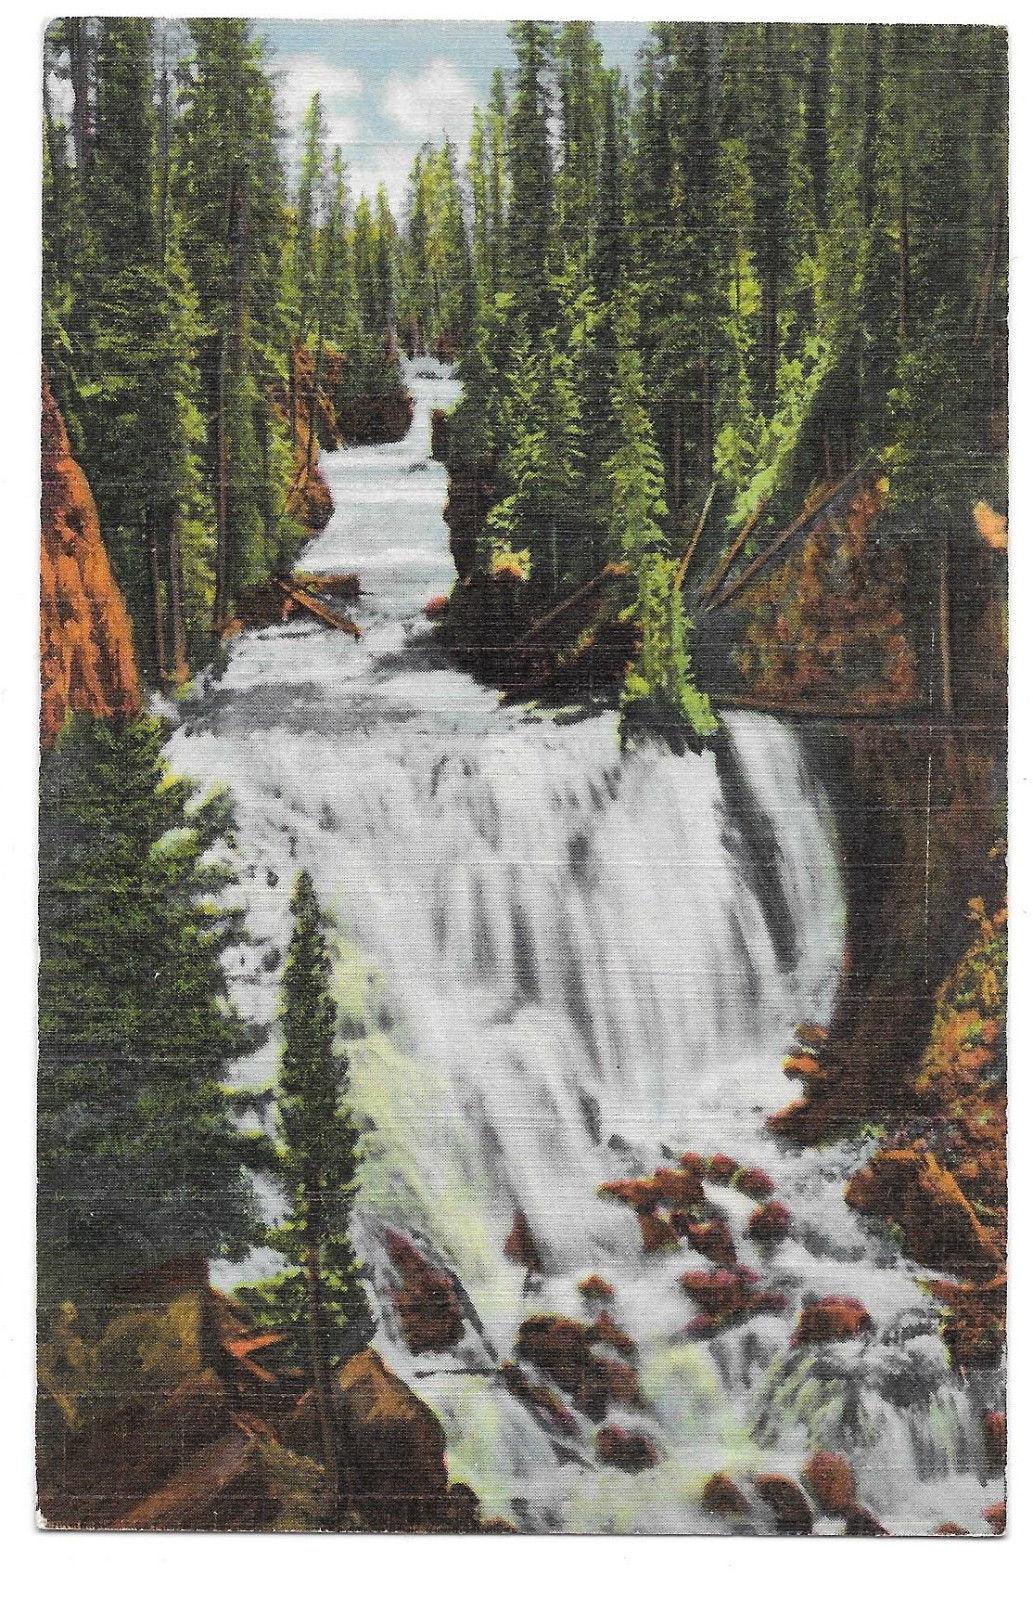 WY Yellowstone Park Kepler Cascades Firehole River Vtg Linen Postcard Wyoming